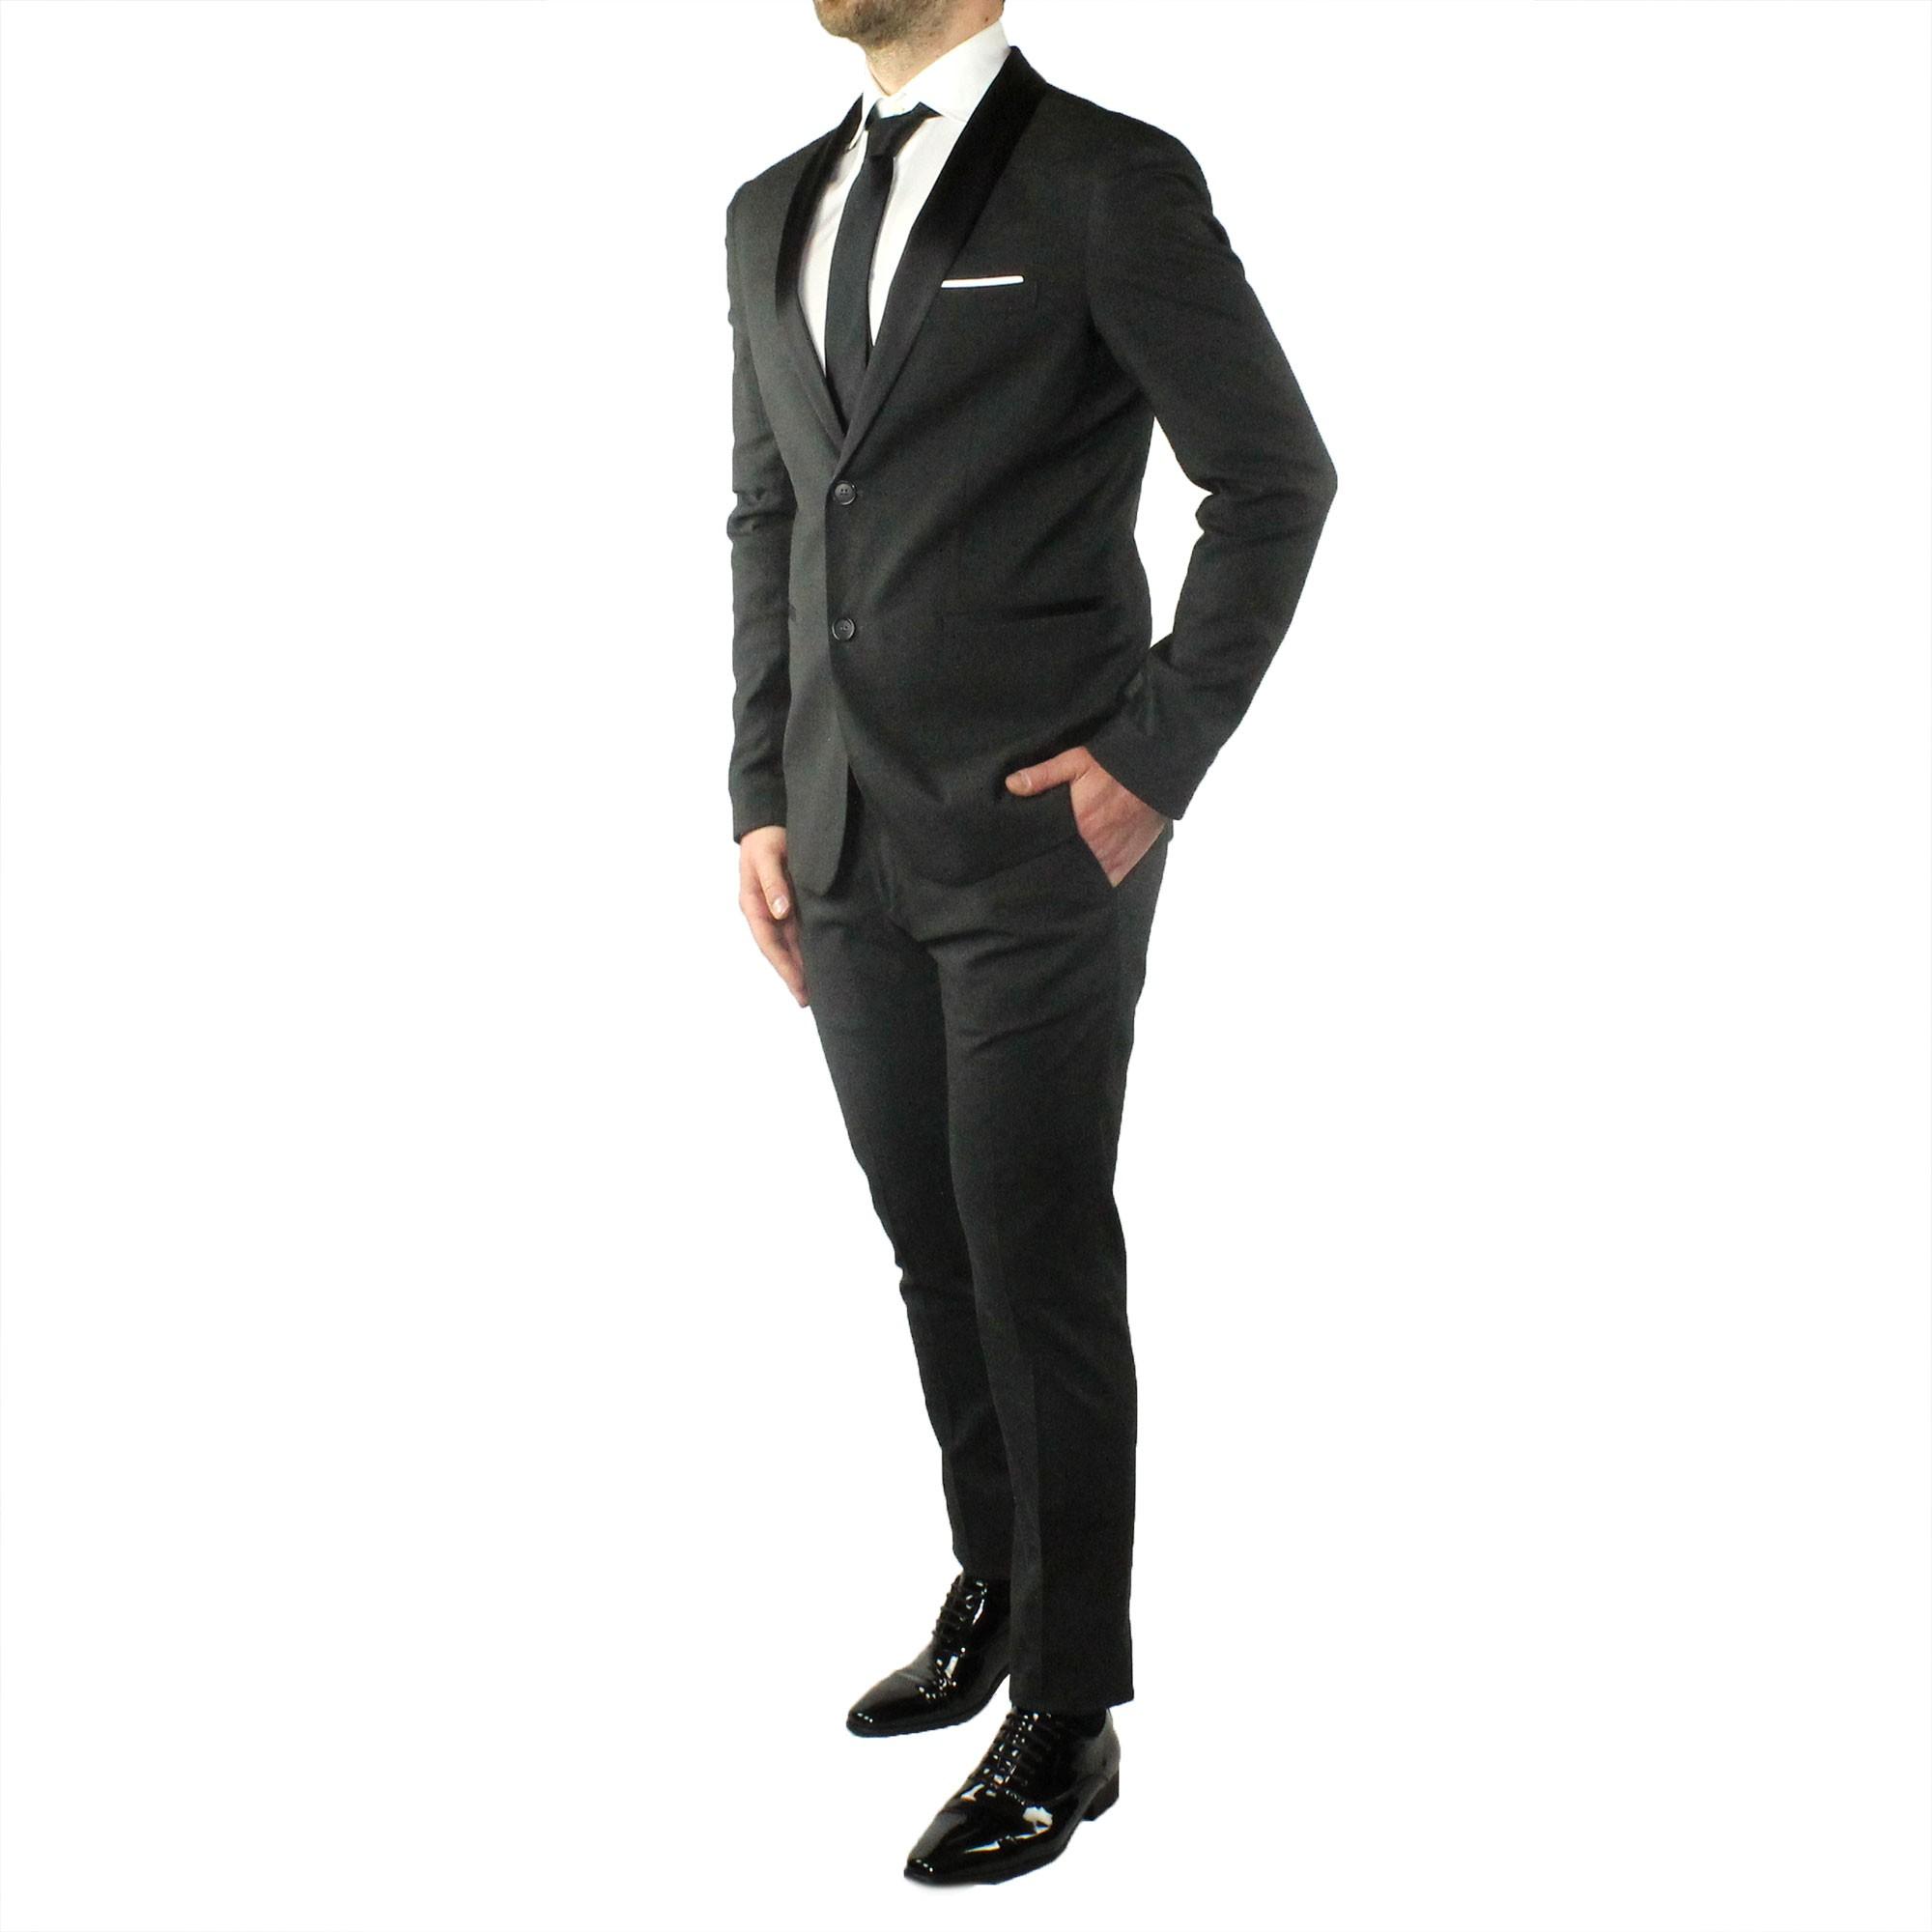 Abito-Uomo-Smoking-Elegante-Vestito-Completo-Estivo-Cerimonia-Sartoriale-Slim miniatura 12